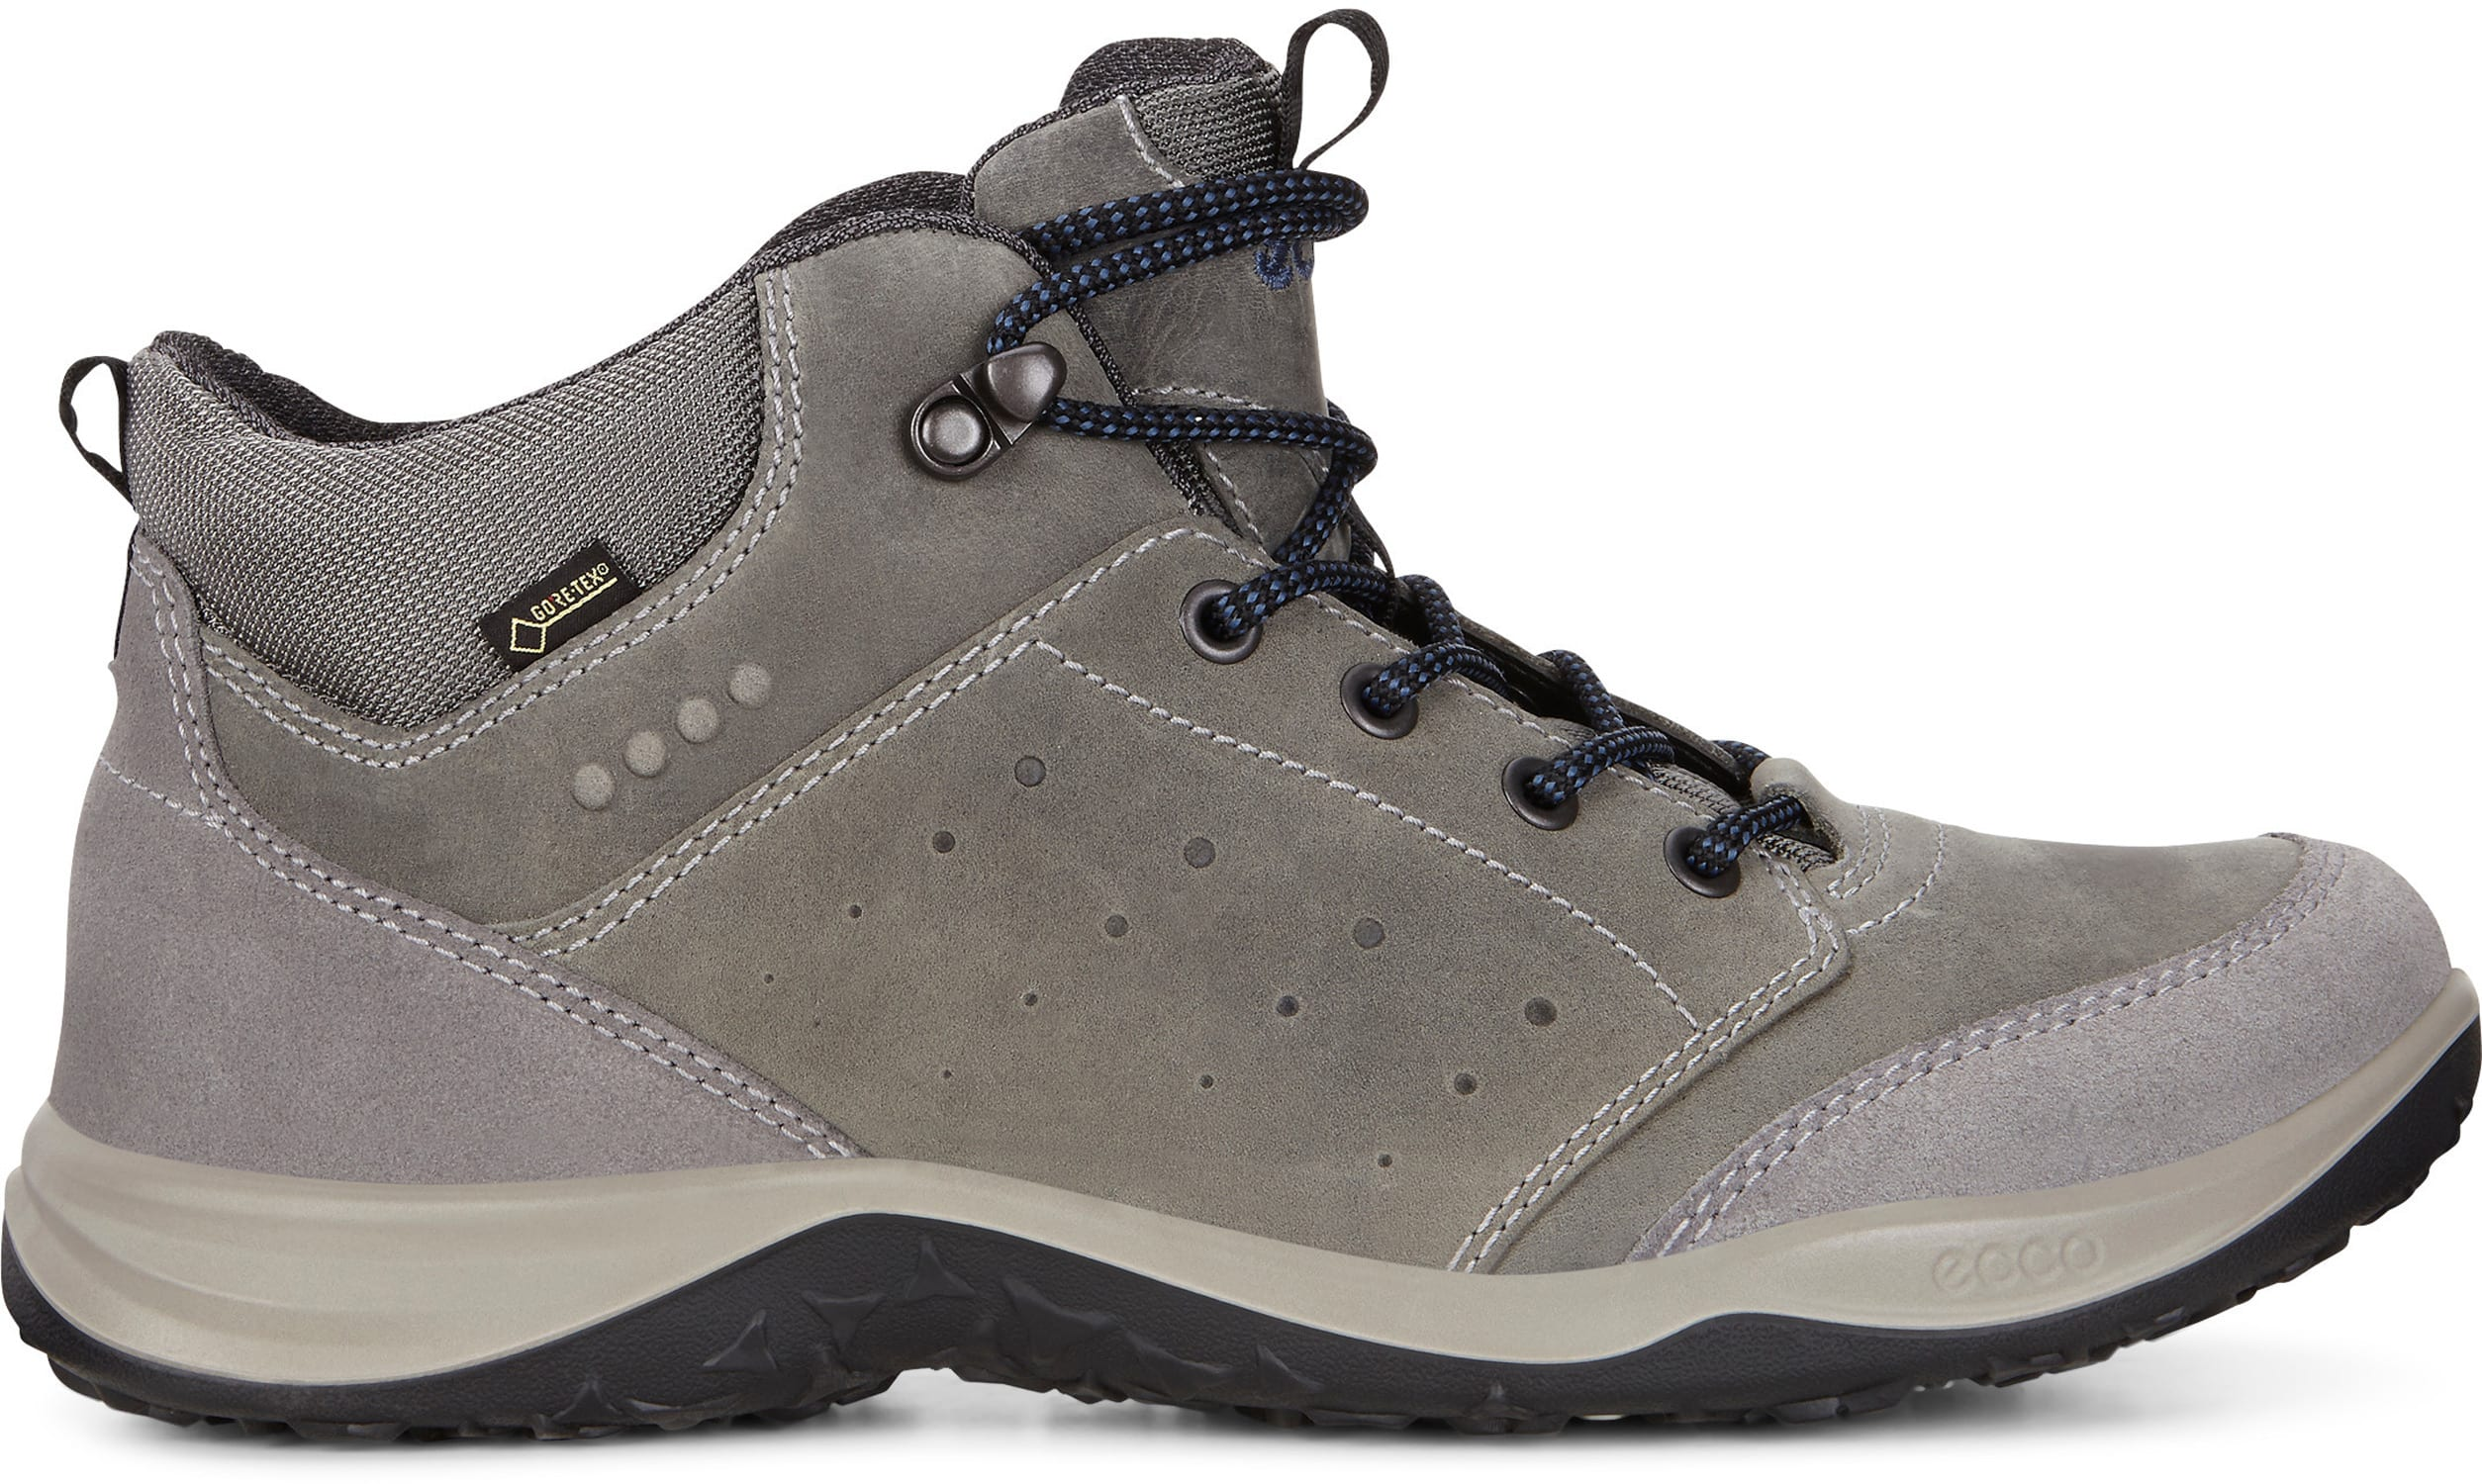 ECCO Espinho High Gore-Tex Hiking Boots